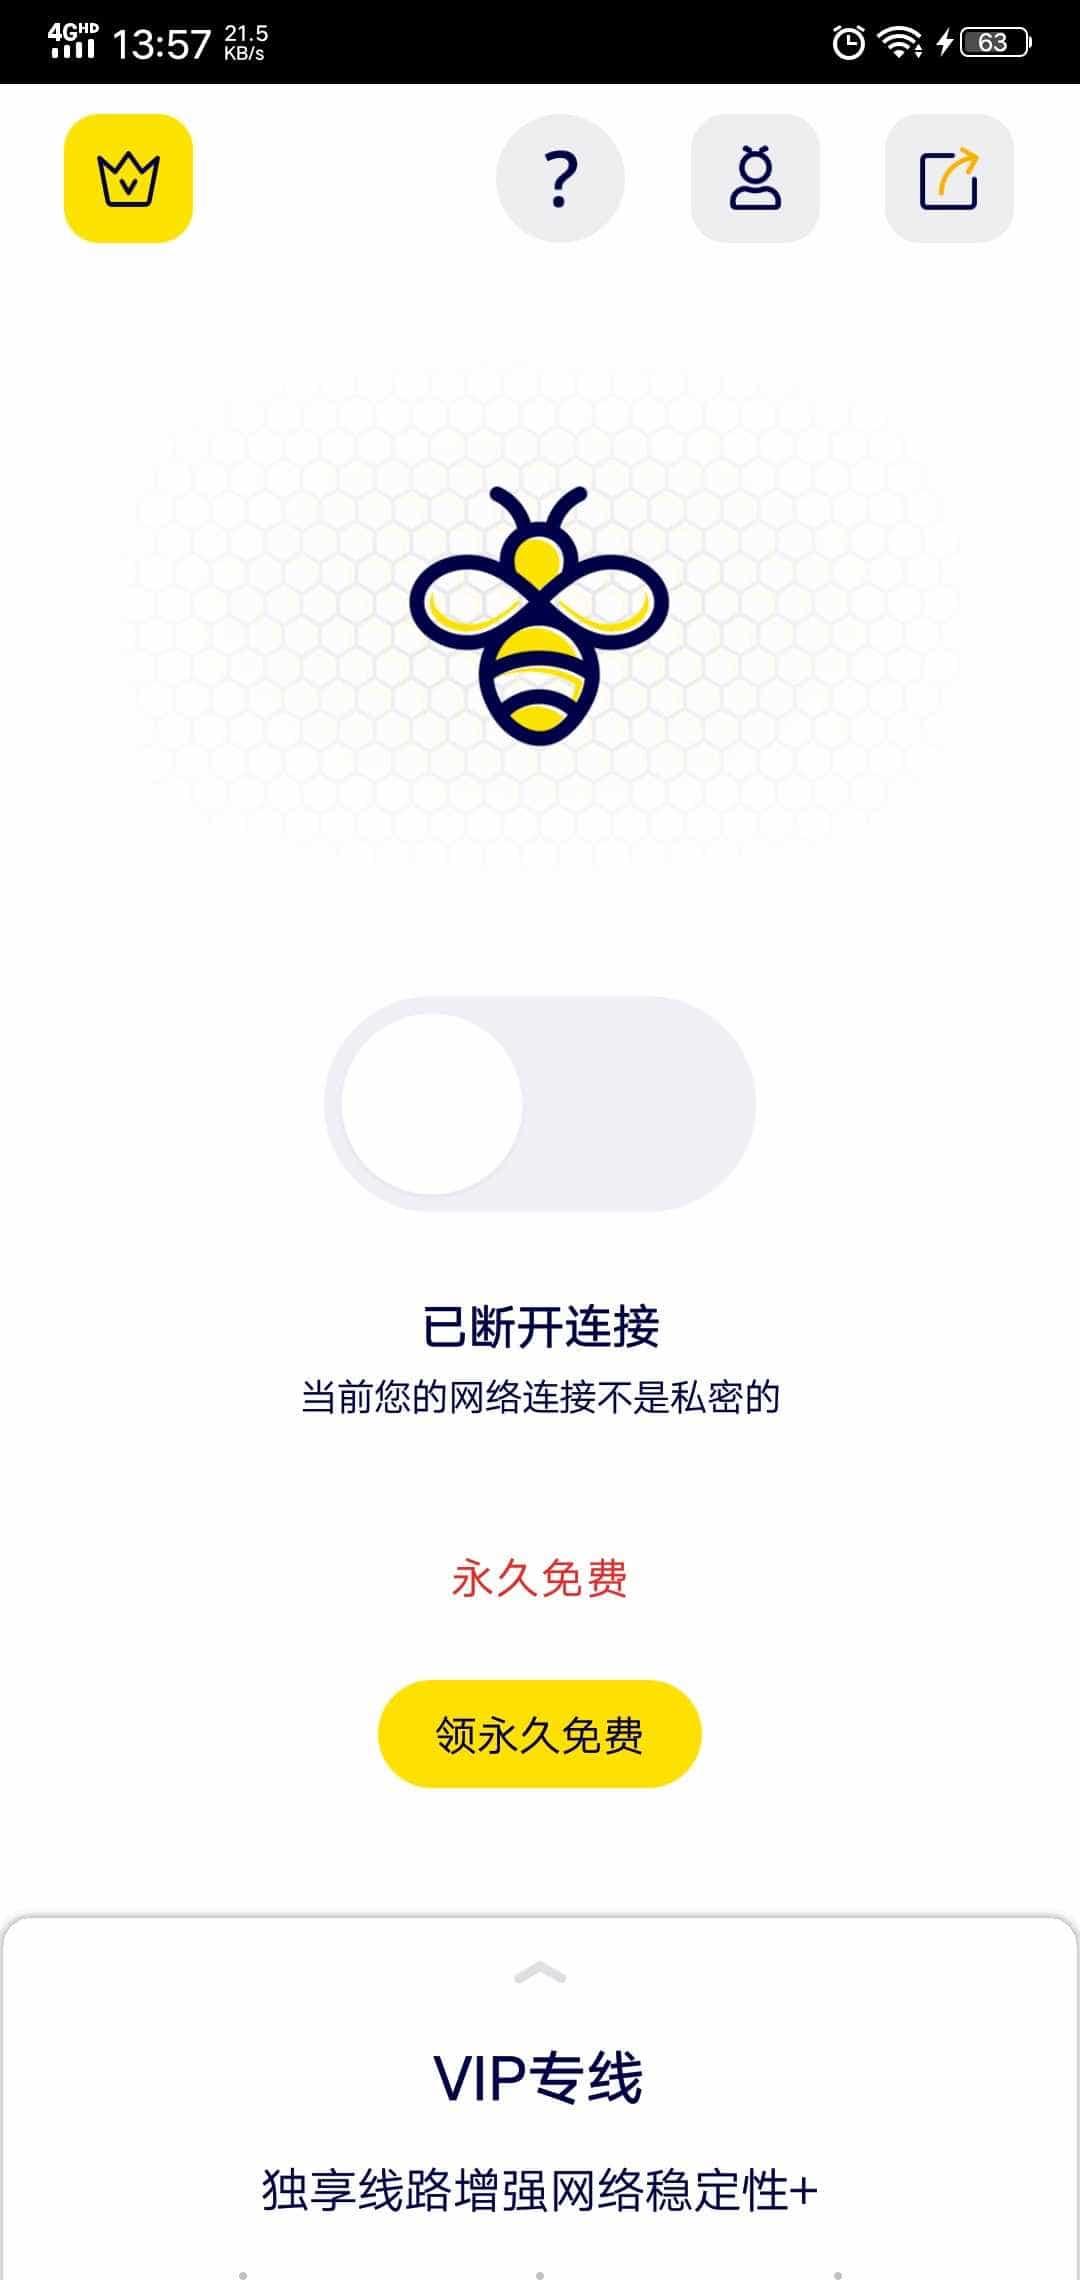 Screenshot_20200401_135706